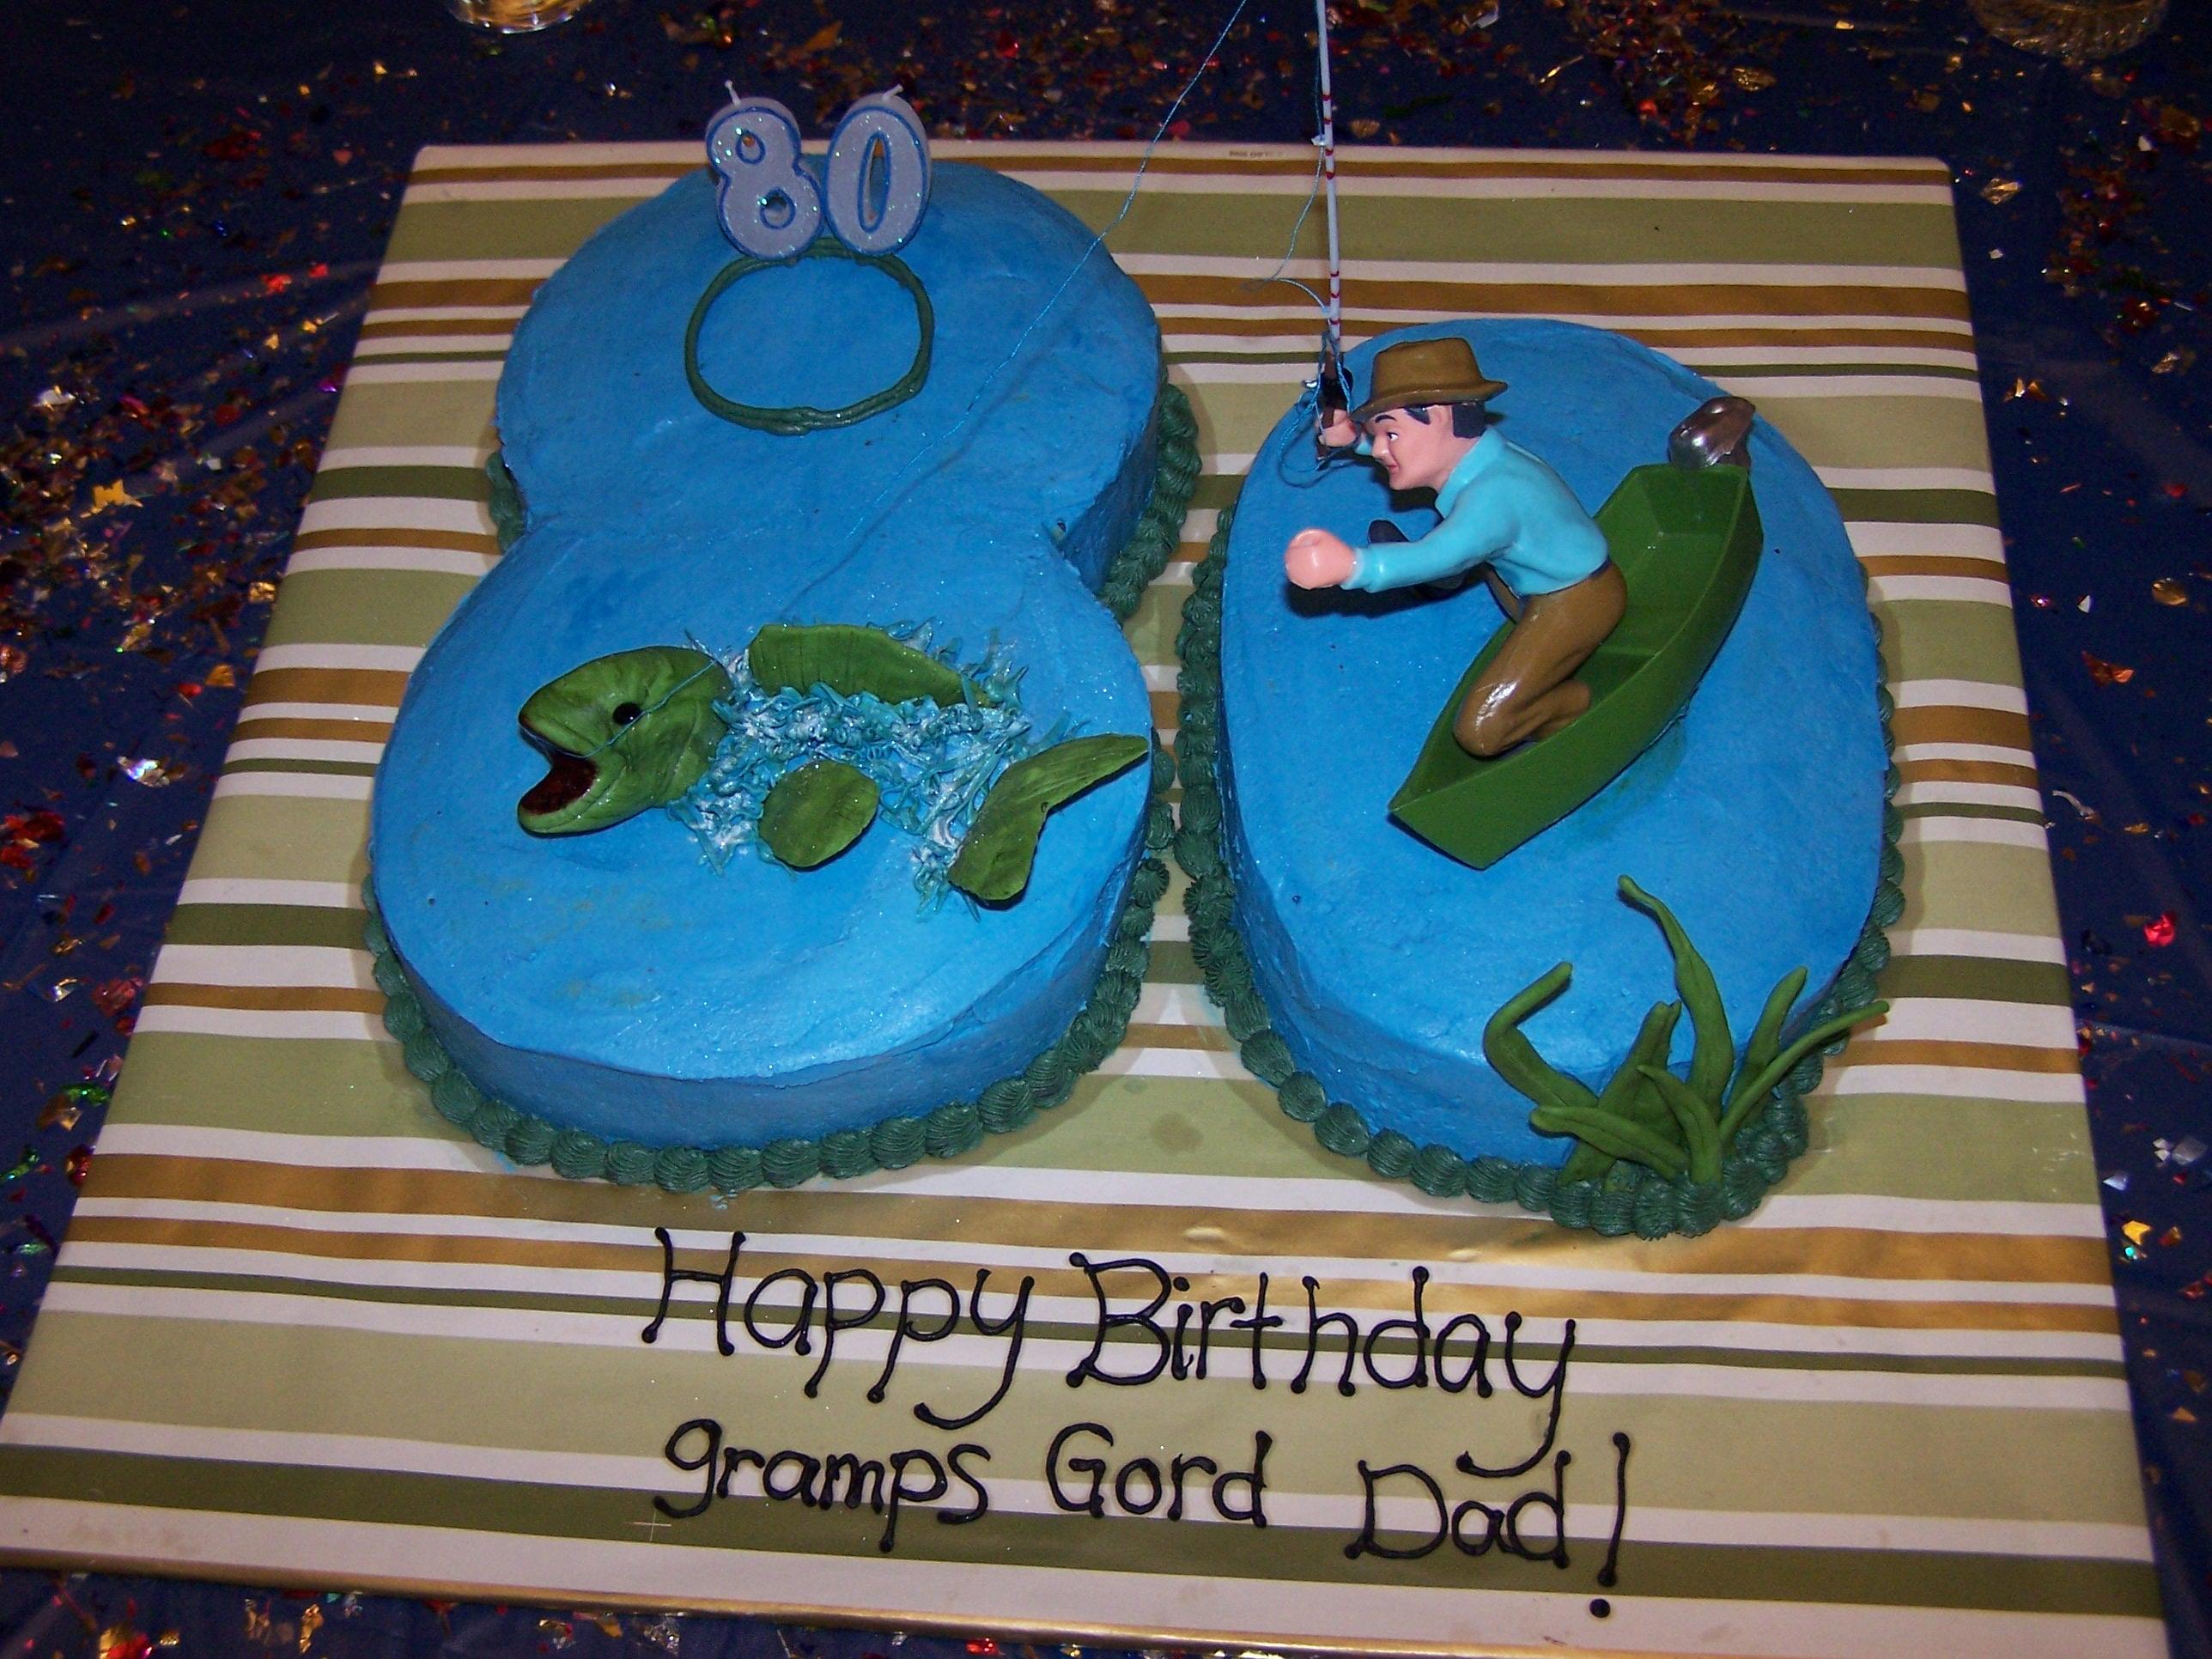 Birthday Cake Design For Grandpa Image Inspiration of Cake and